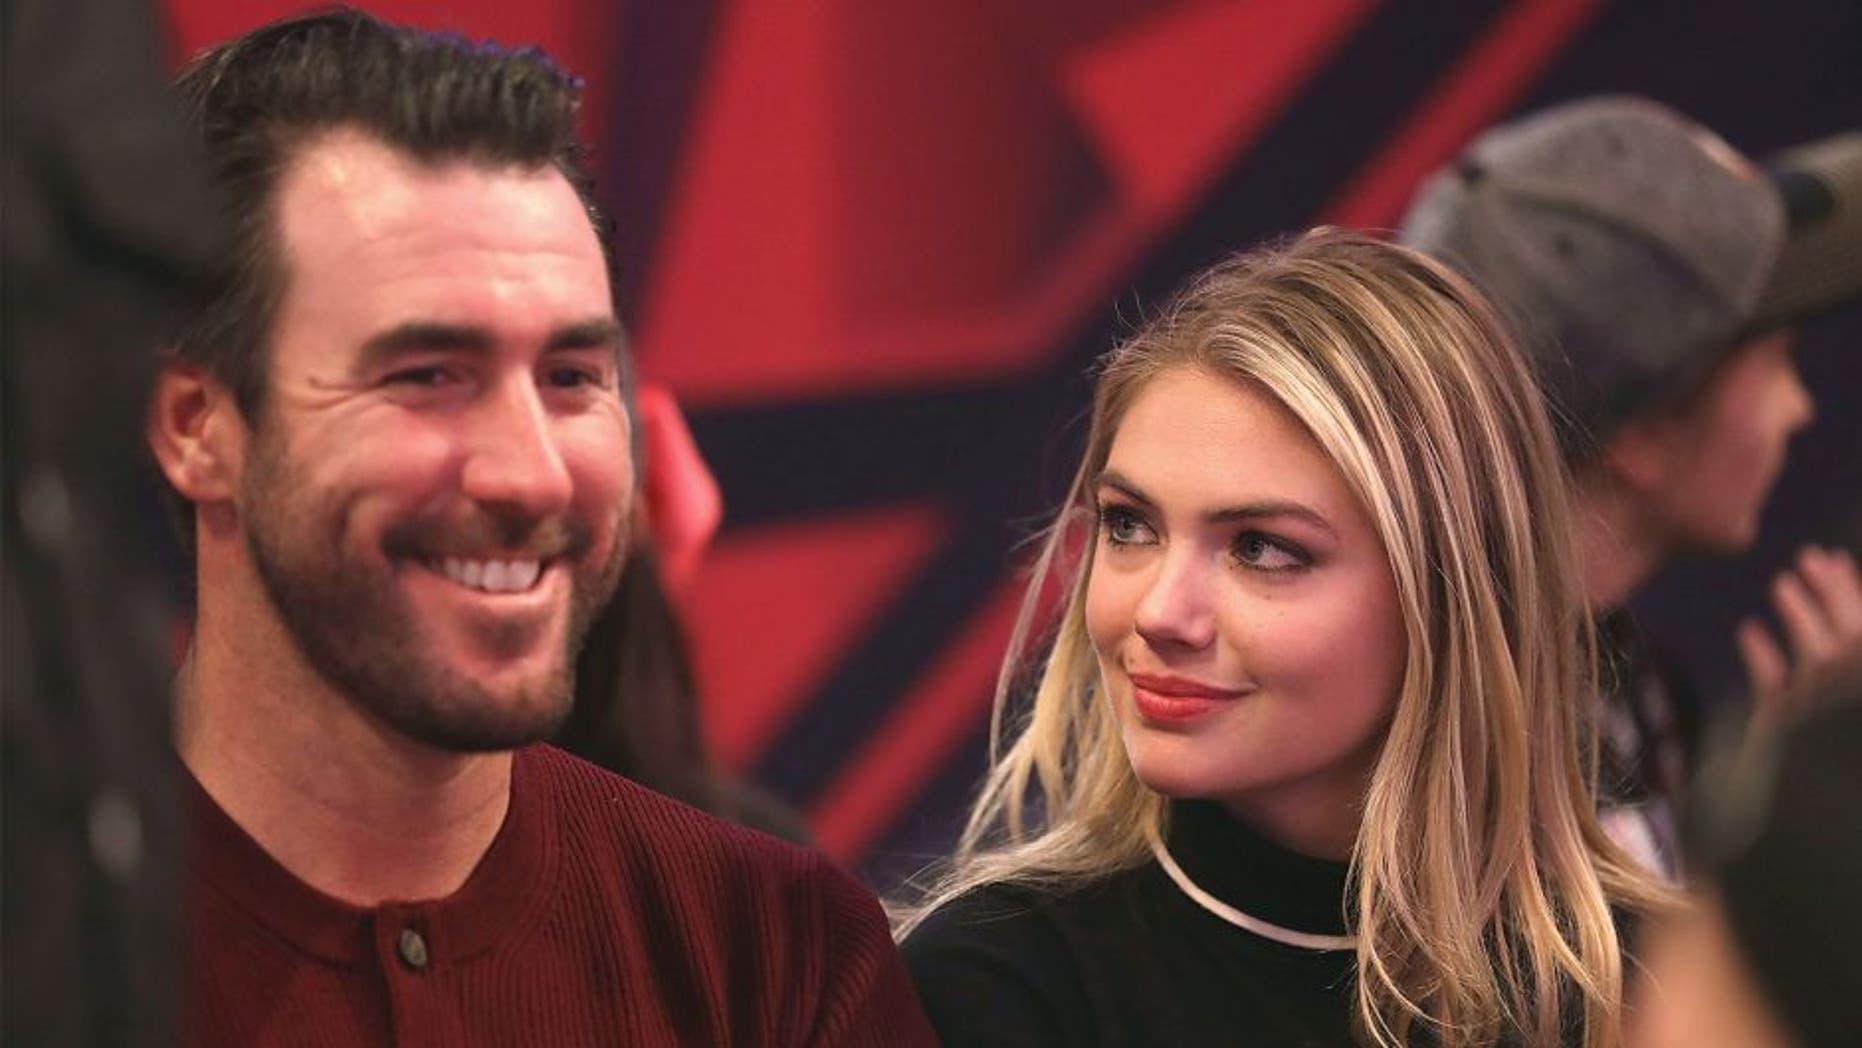 Kate upton dating nba star